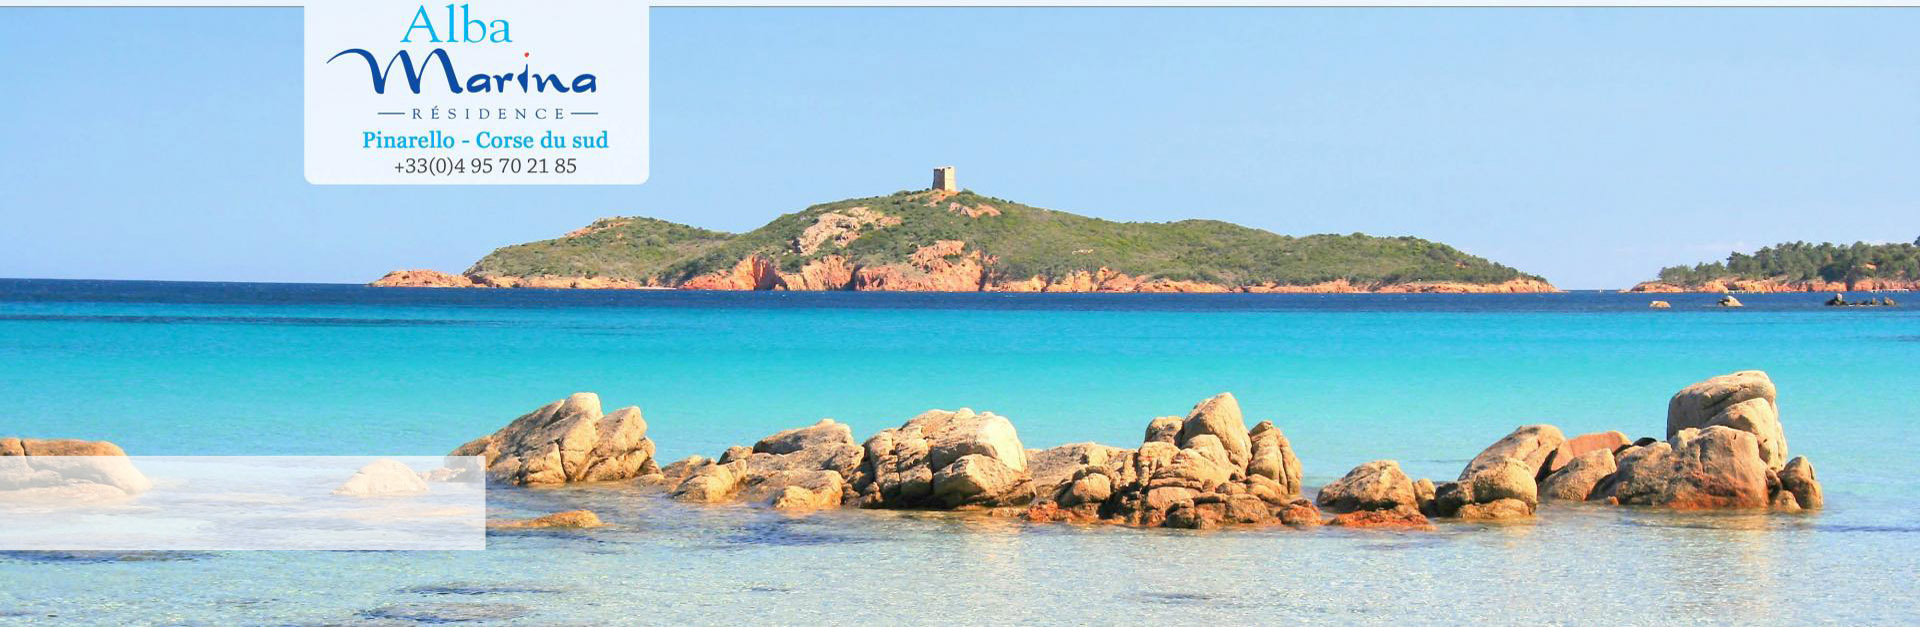 Ferienhaus Pinarellu Korsika